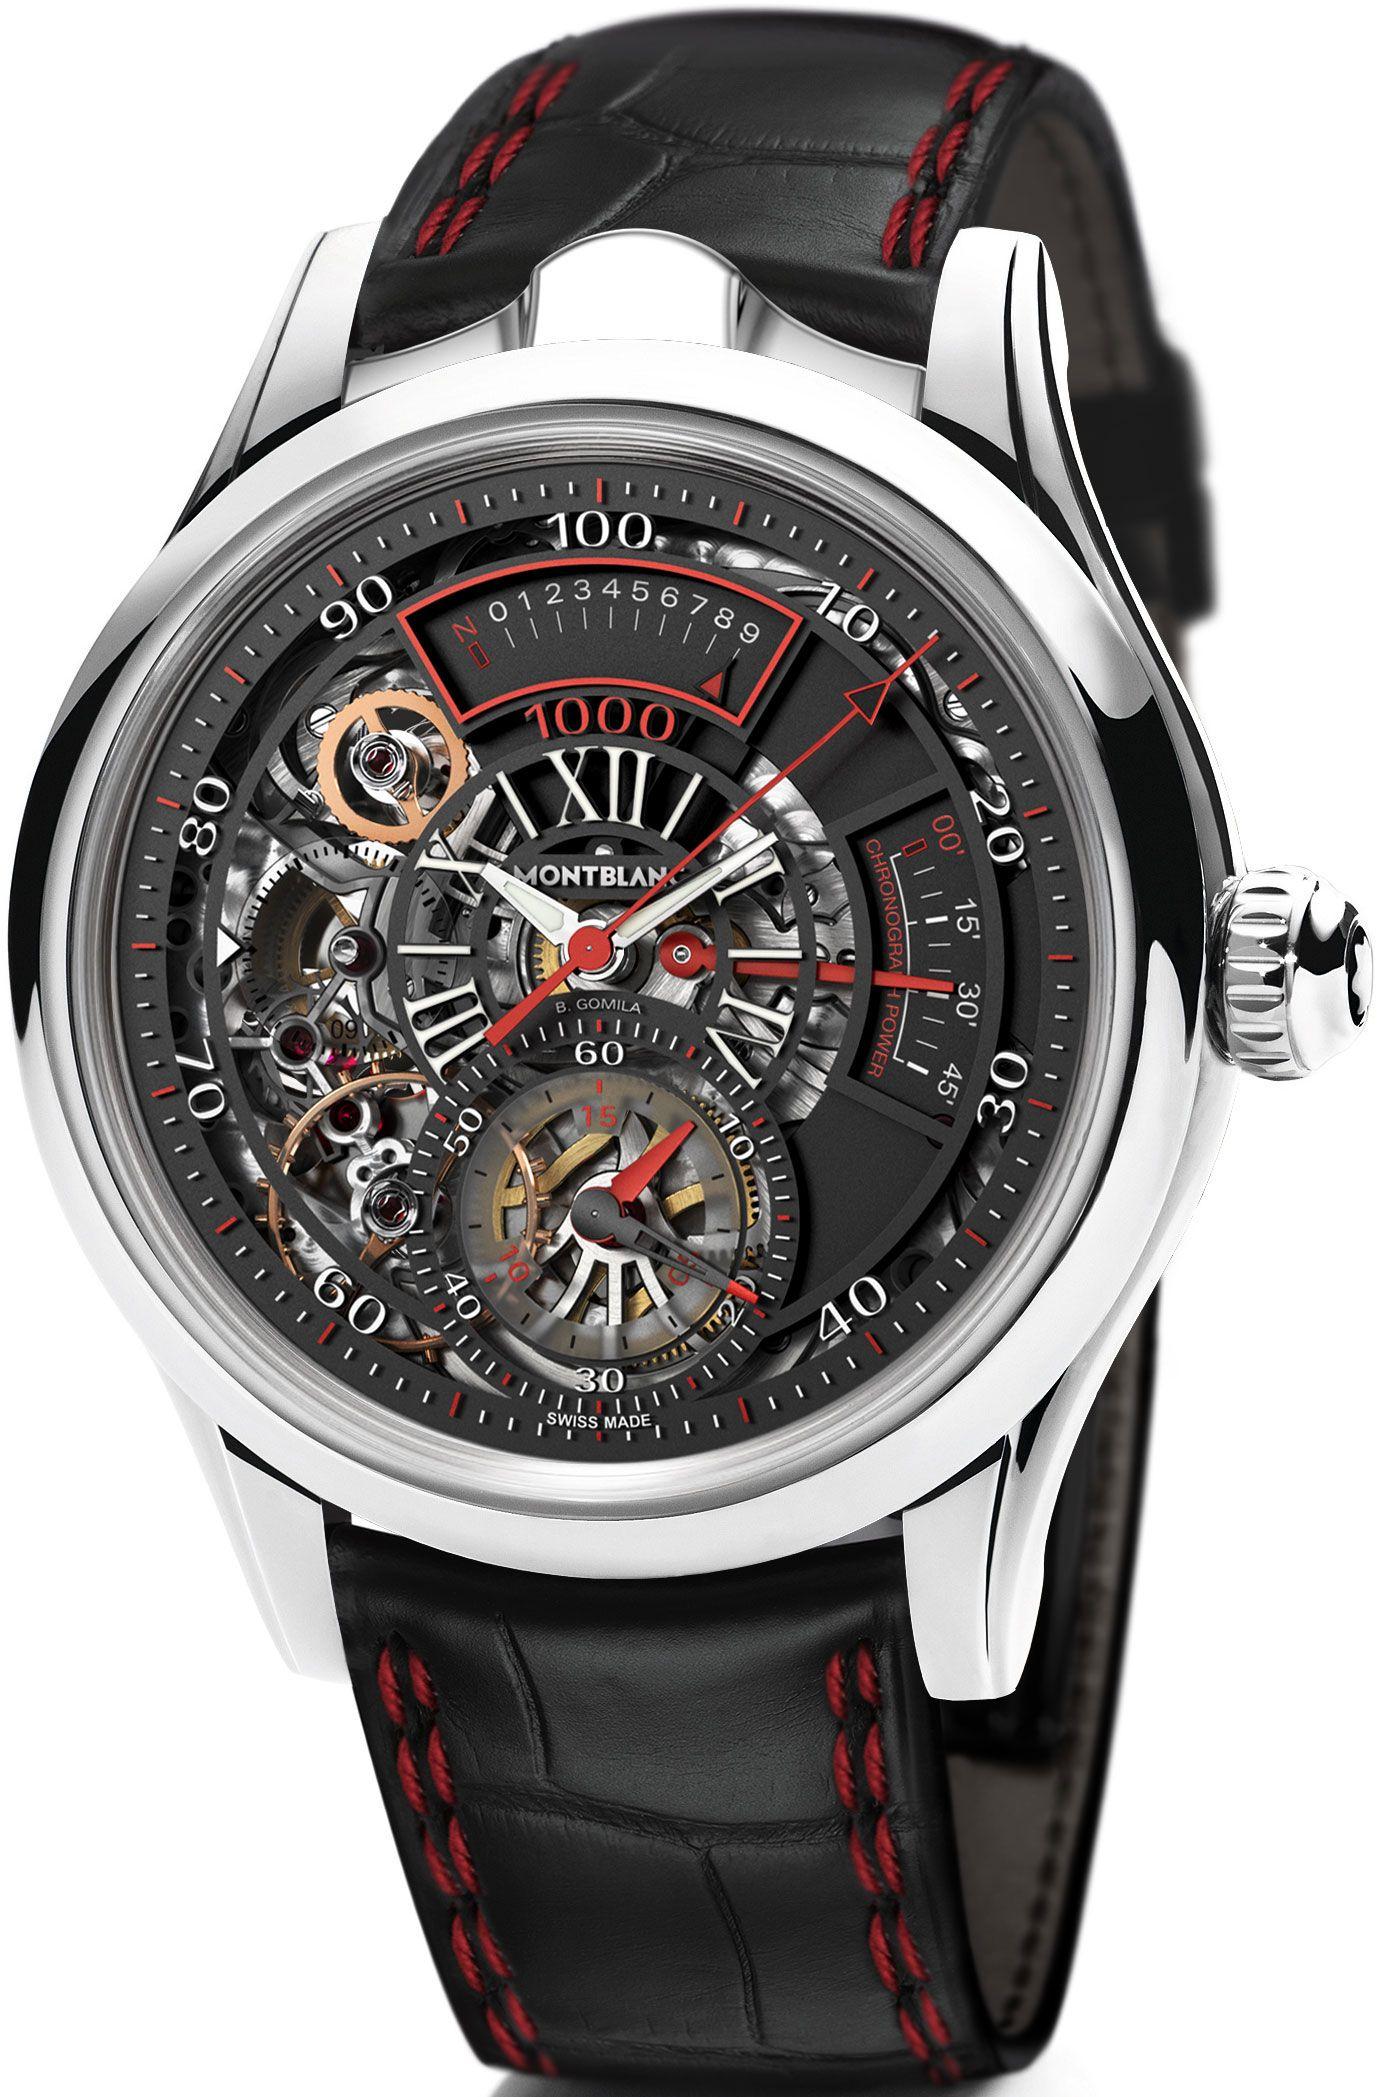 d1bb023f882 Montblanc TimeWriter II Chronographe Bi-Fréquence 1.000